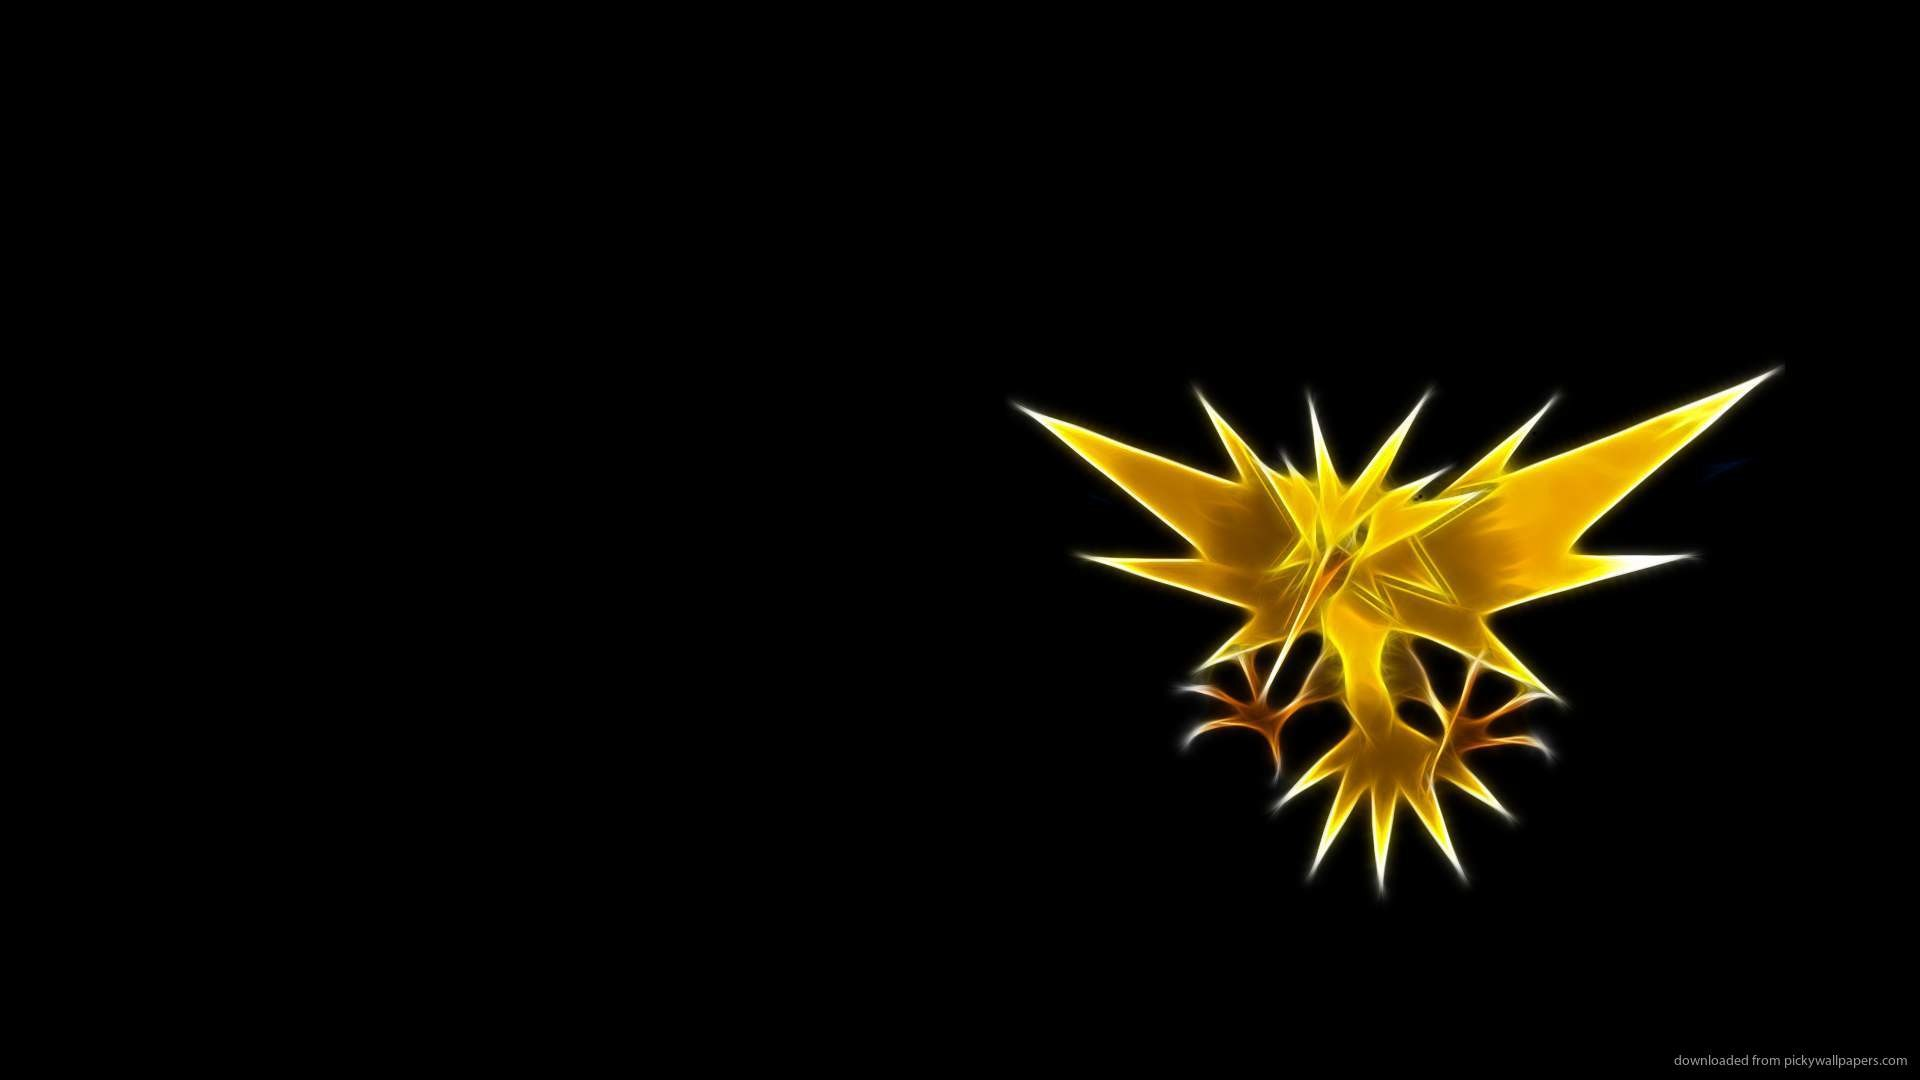 Zapdos Pokemon Wallpaper picture